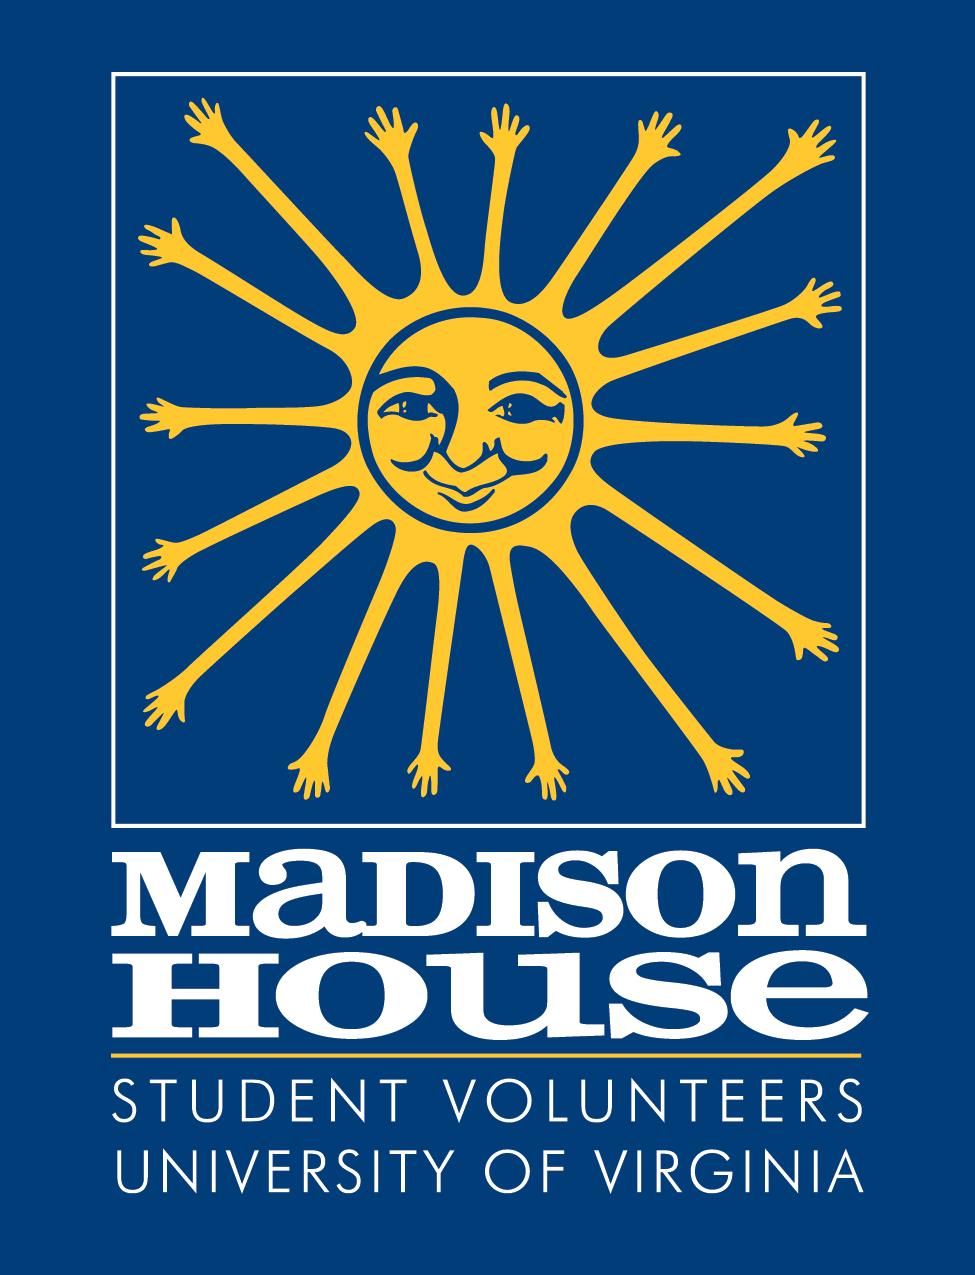 Madison House Vertical Logo